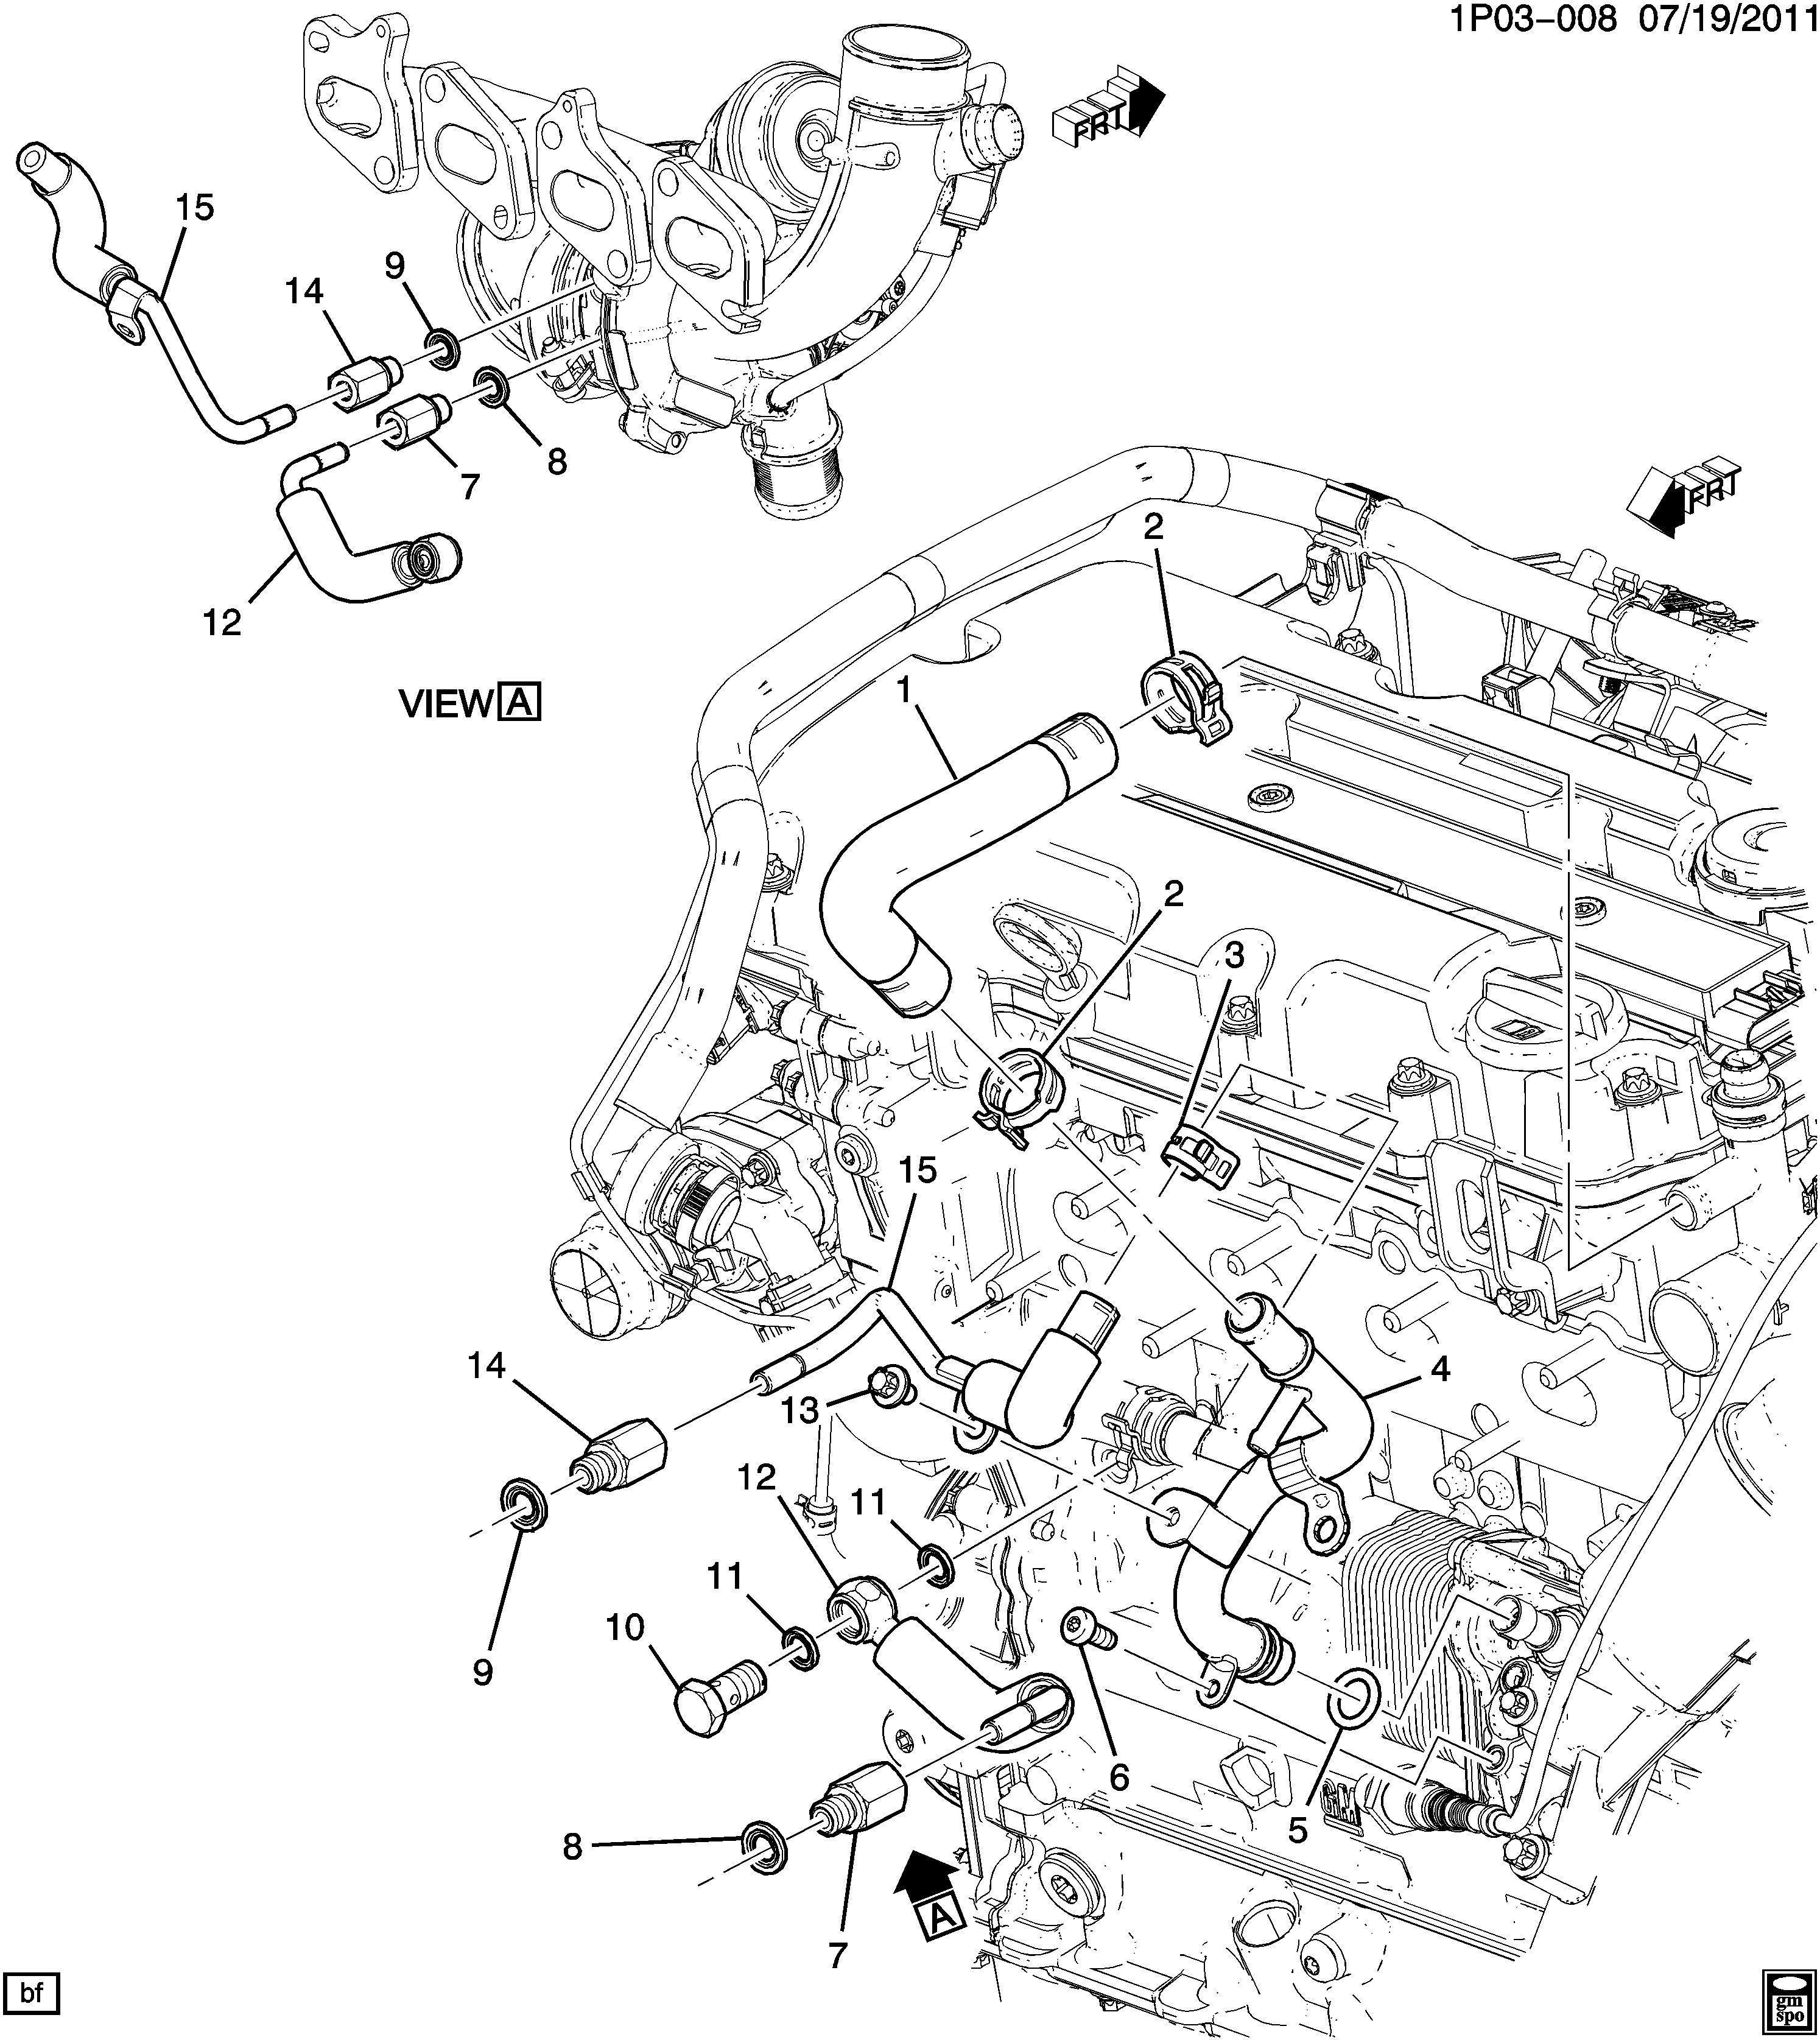 chevy vega wiring diagram vs 2928  cruze engine parts diagram furthermore chevy 305 engine  cruze engine parts diagram furthermore